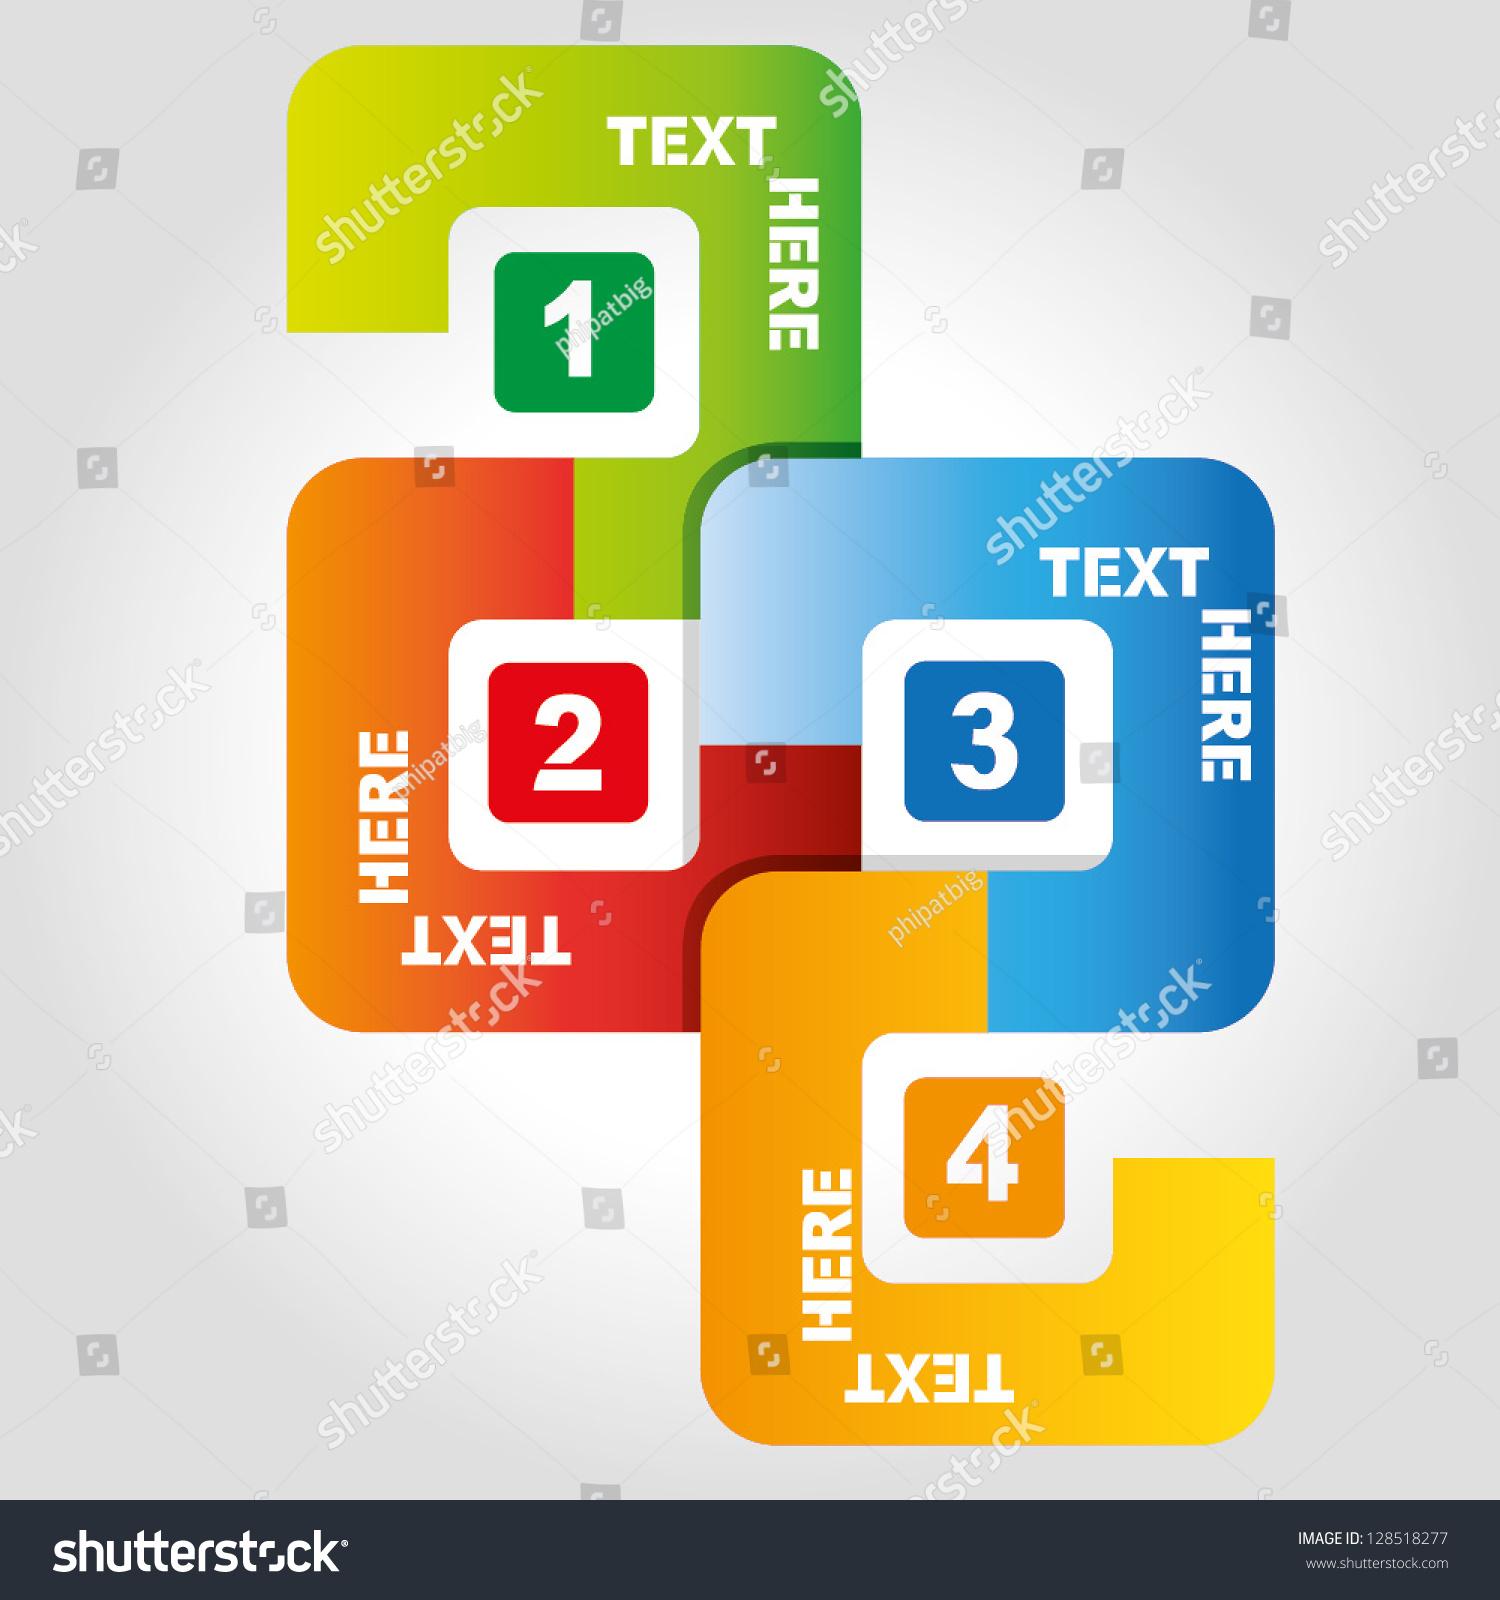 4 squares sequence diagram, business process flow presentation